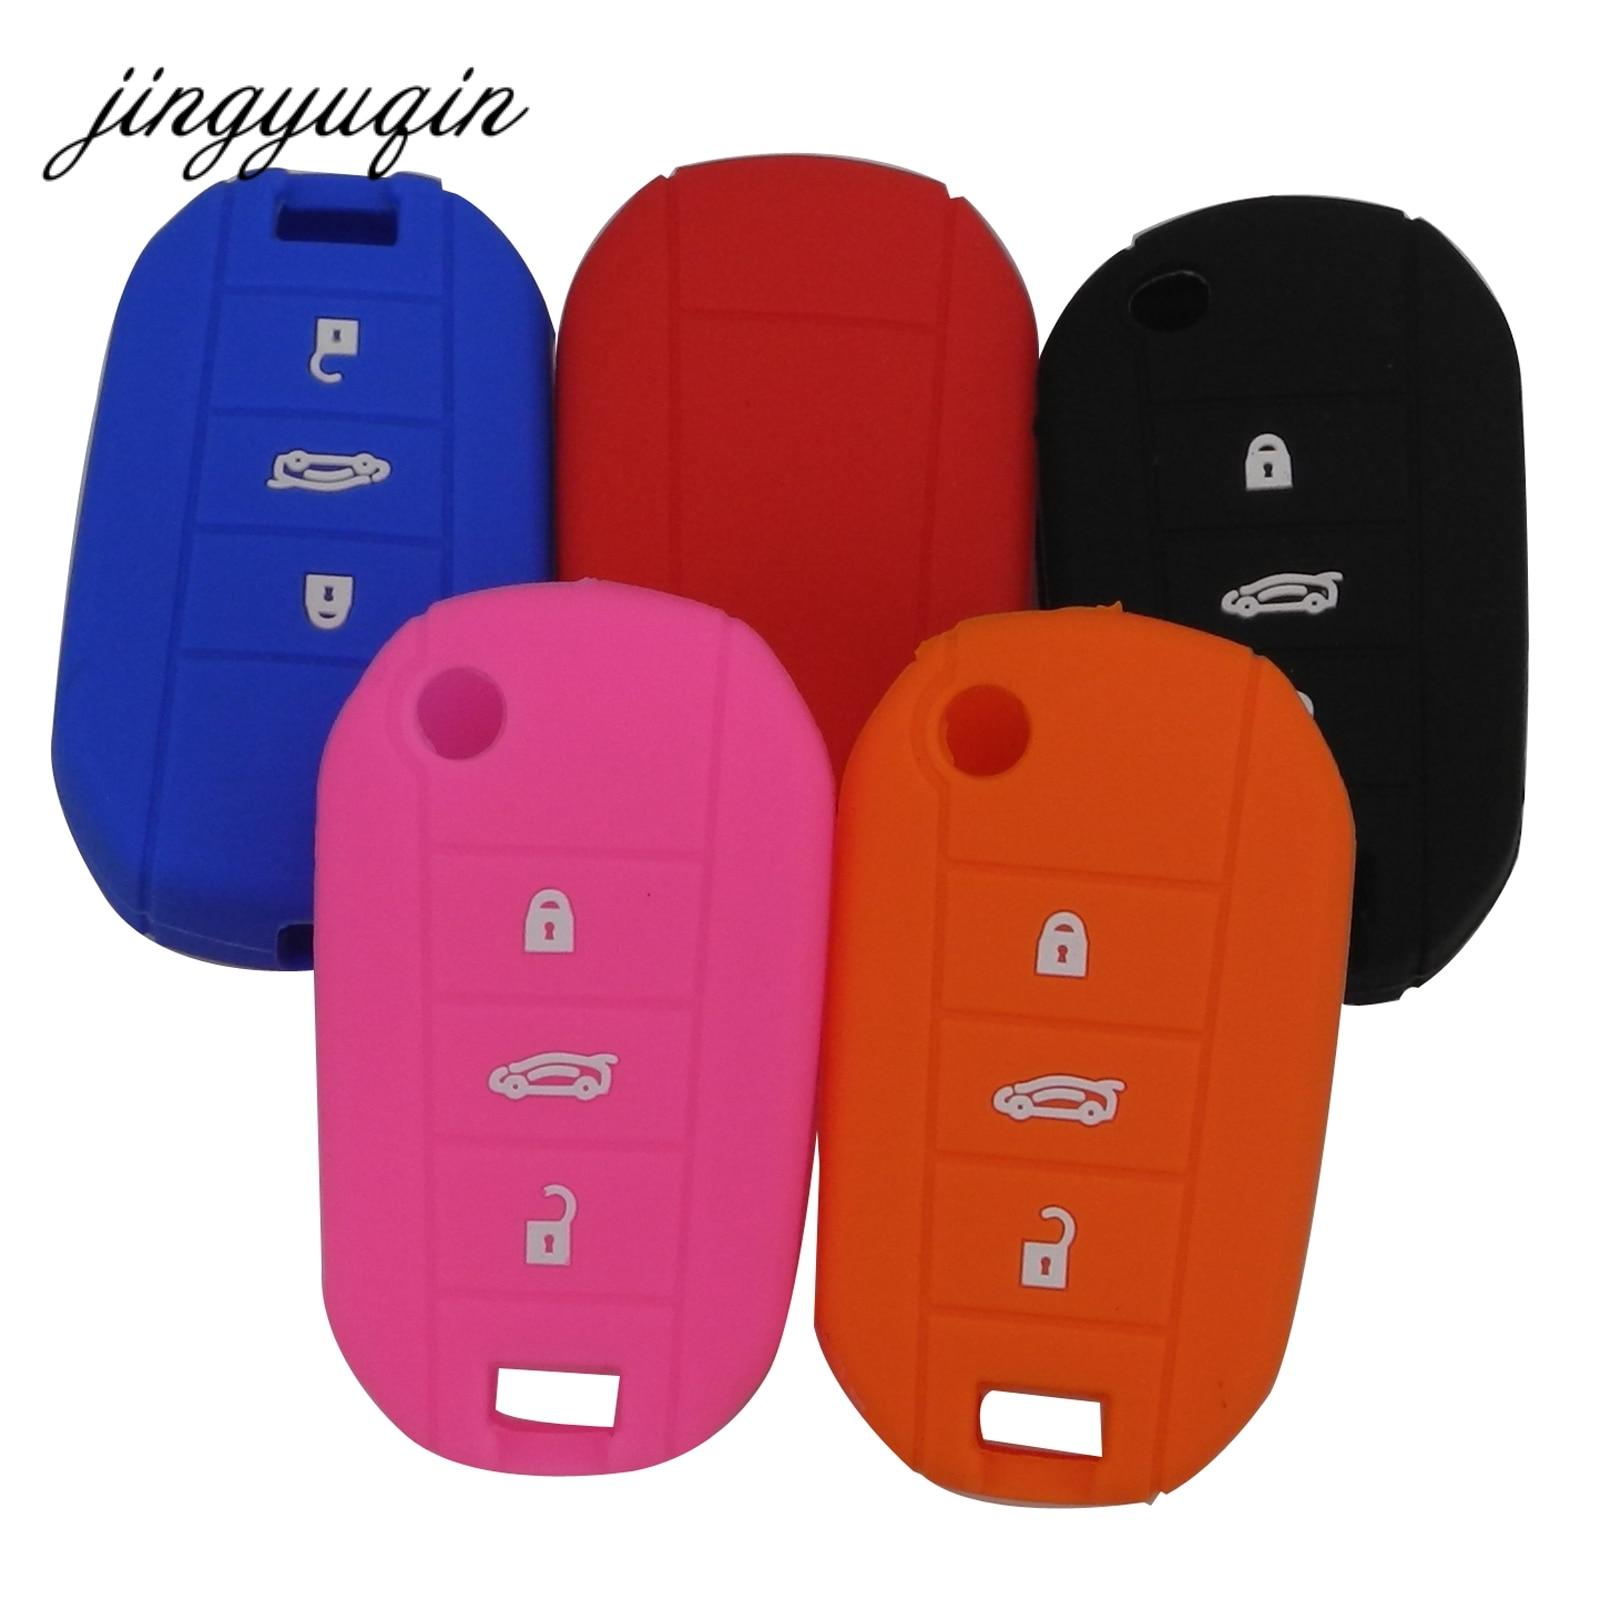 Jingyuqin 30 unids/lote cubierta de silicona con tapa para llave de coche para Citroen C4 CACTUS C5 C3 C4L Peugeot 508 301 2008 3008 408 llavero